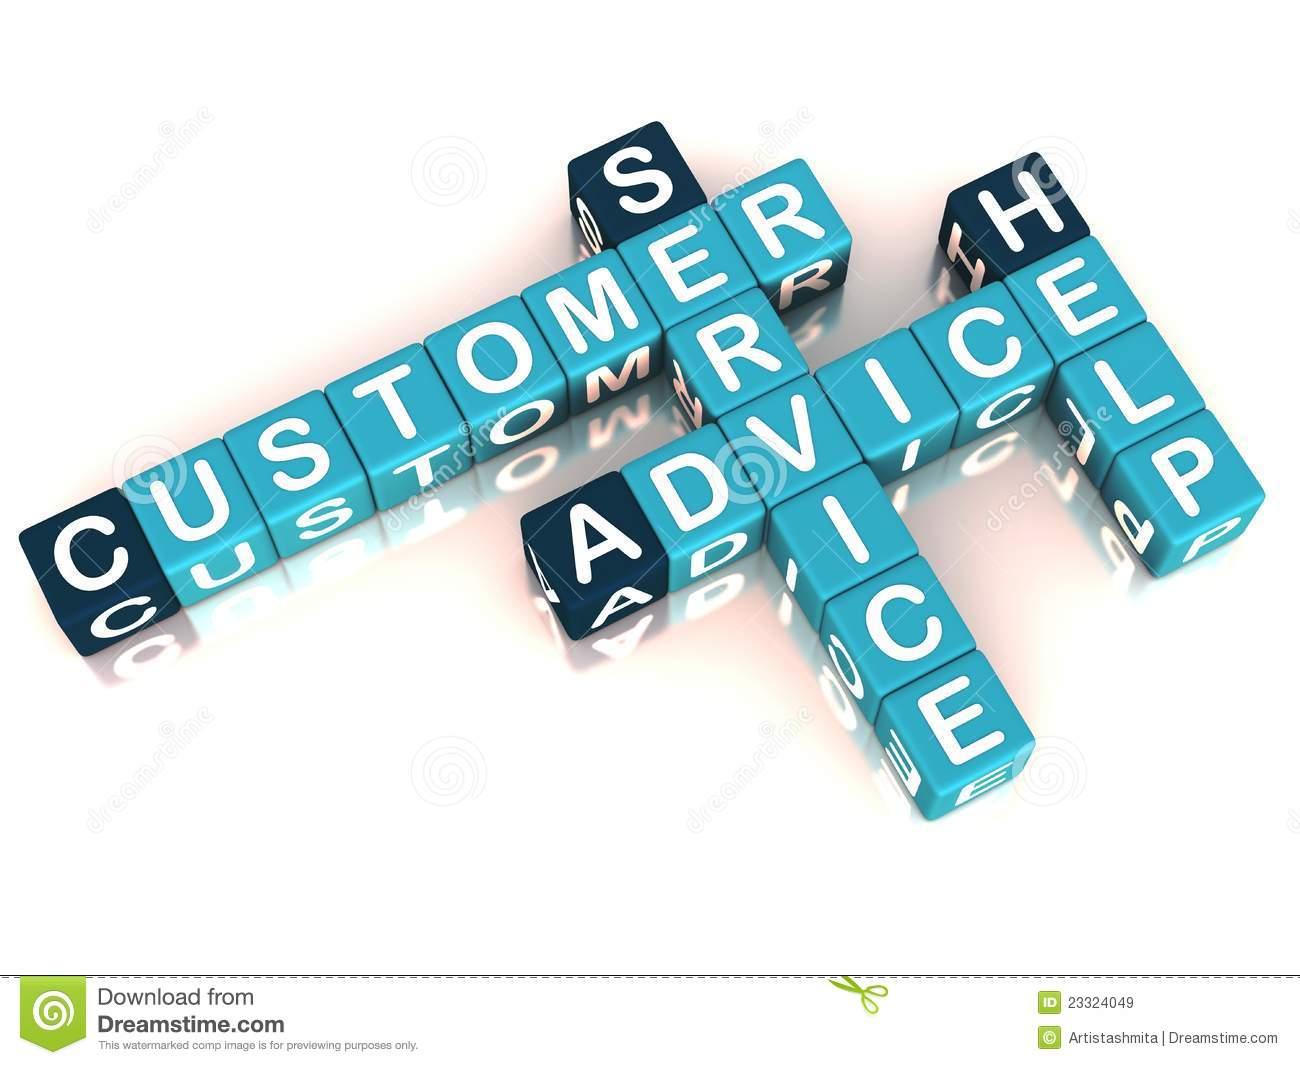 Customer service clip art jpg download Customer service clipart images free - ClipartFest jpg download